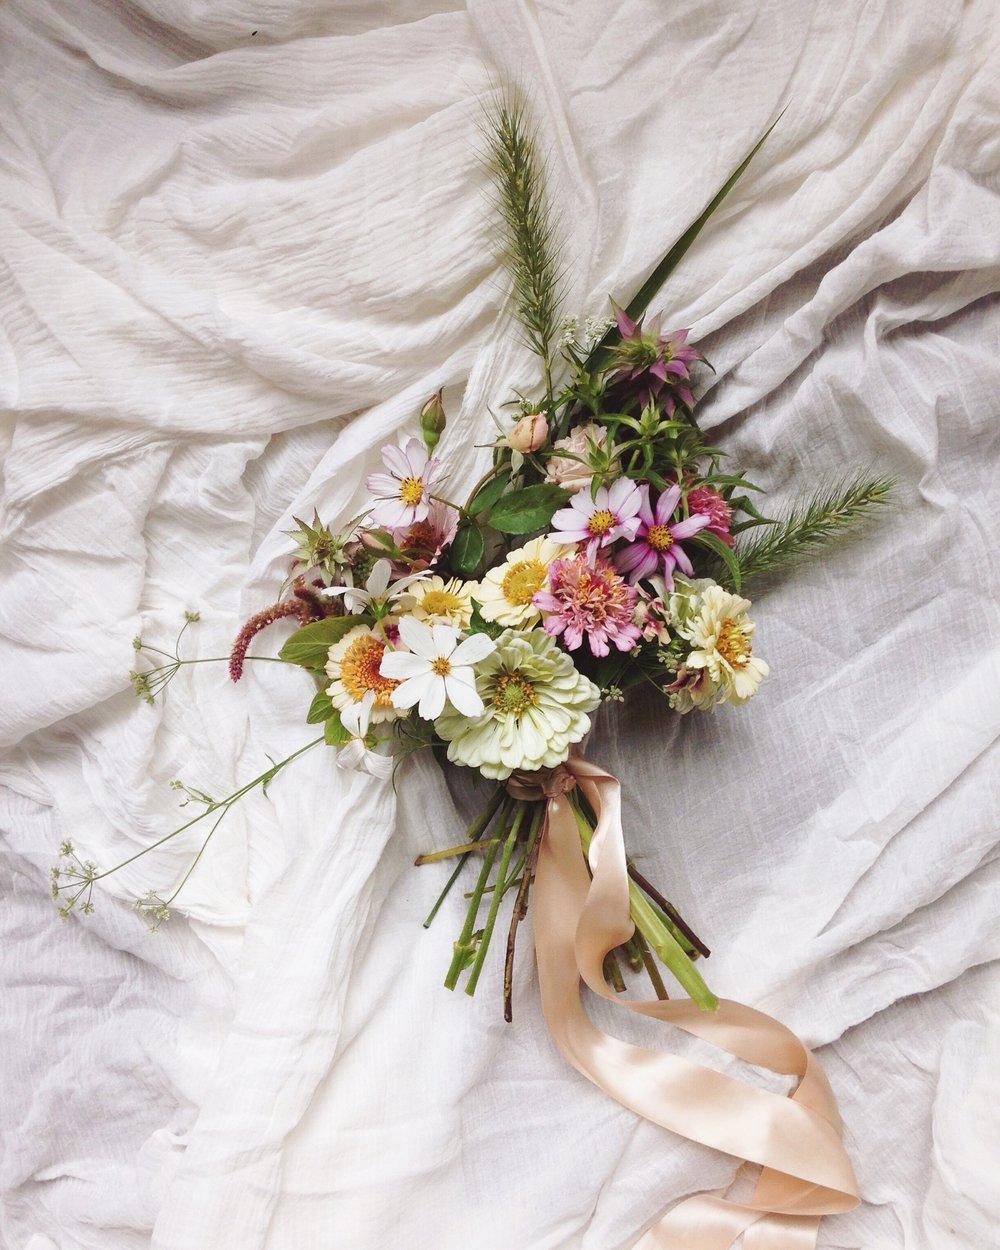 bridesmaid bouquet - seasonal blooms, lush greenery, satin ribbon (upgrade to silk +$50)medium: $115small: $90